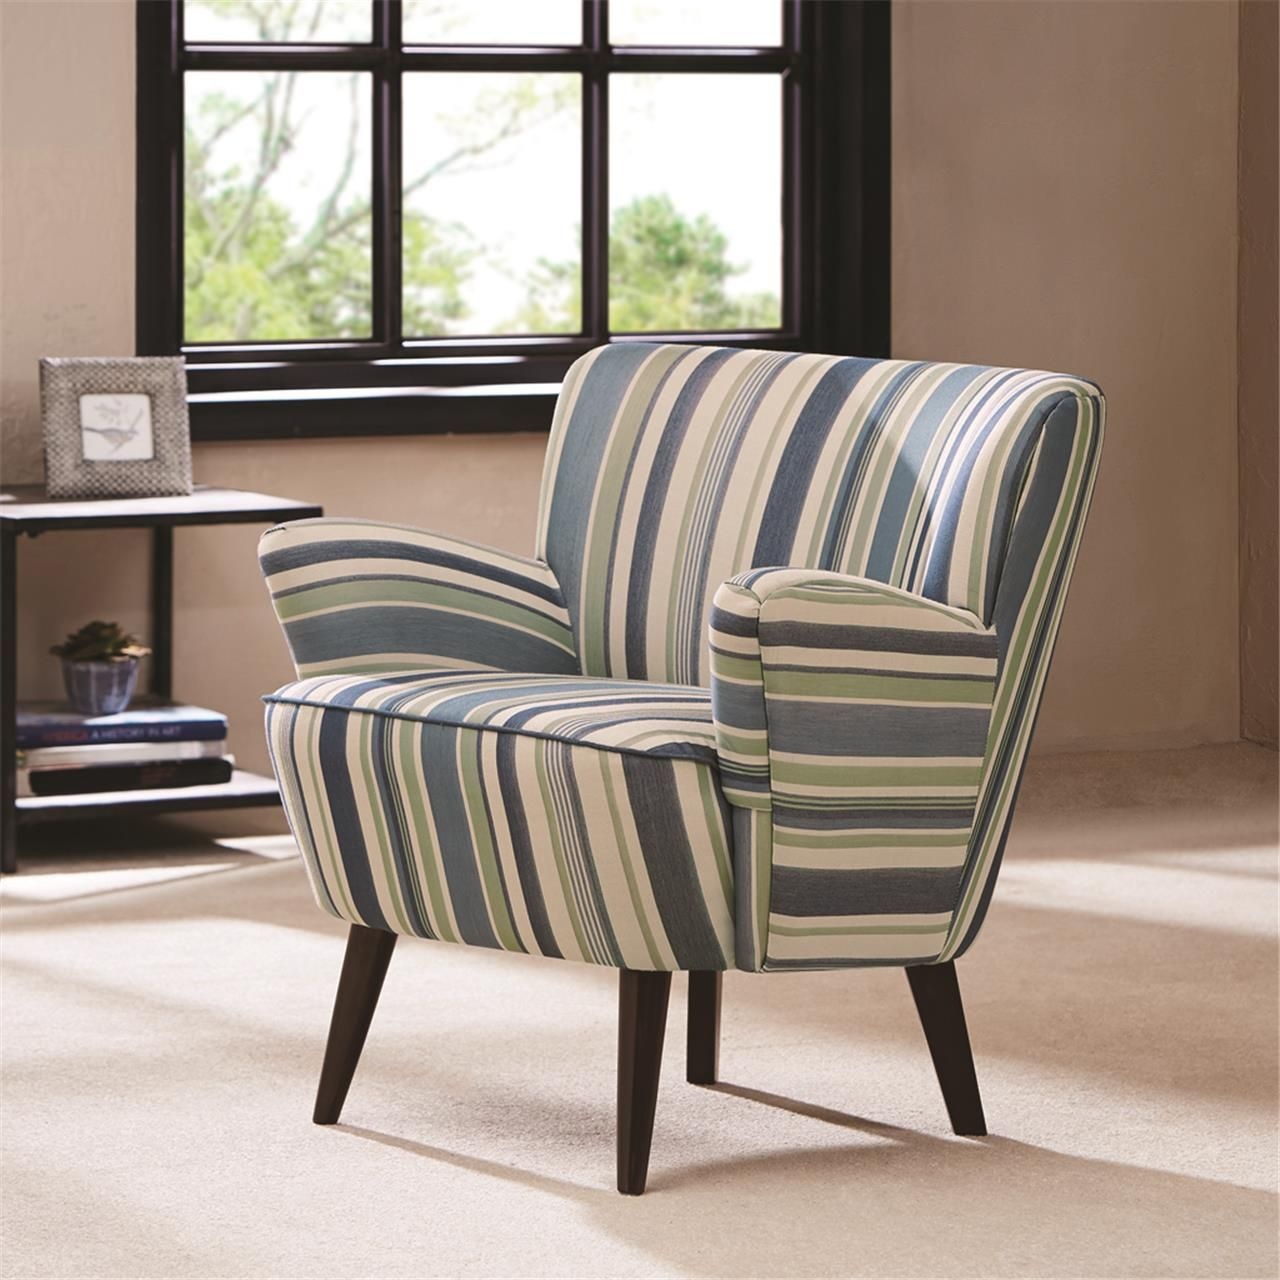 Chair Designs For Living Room Madison Park Sophie Chairdesigner Living  Bedroom Decor